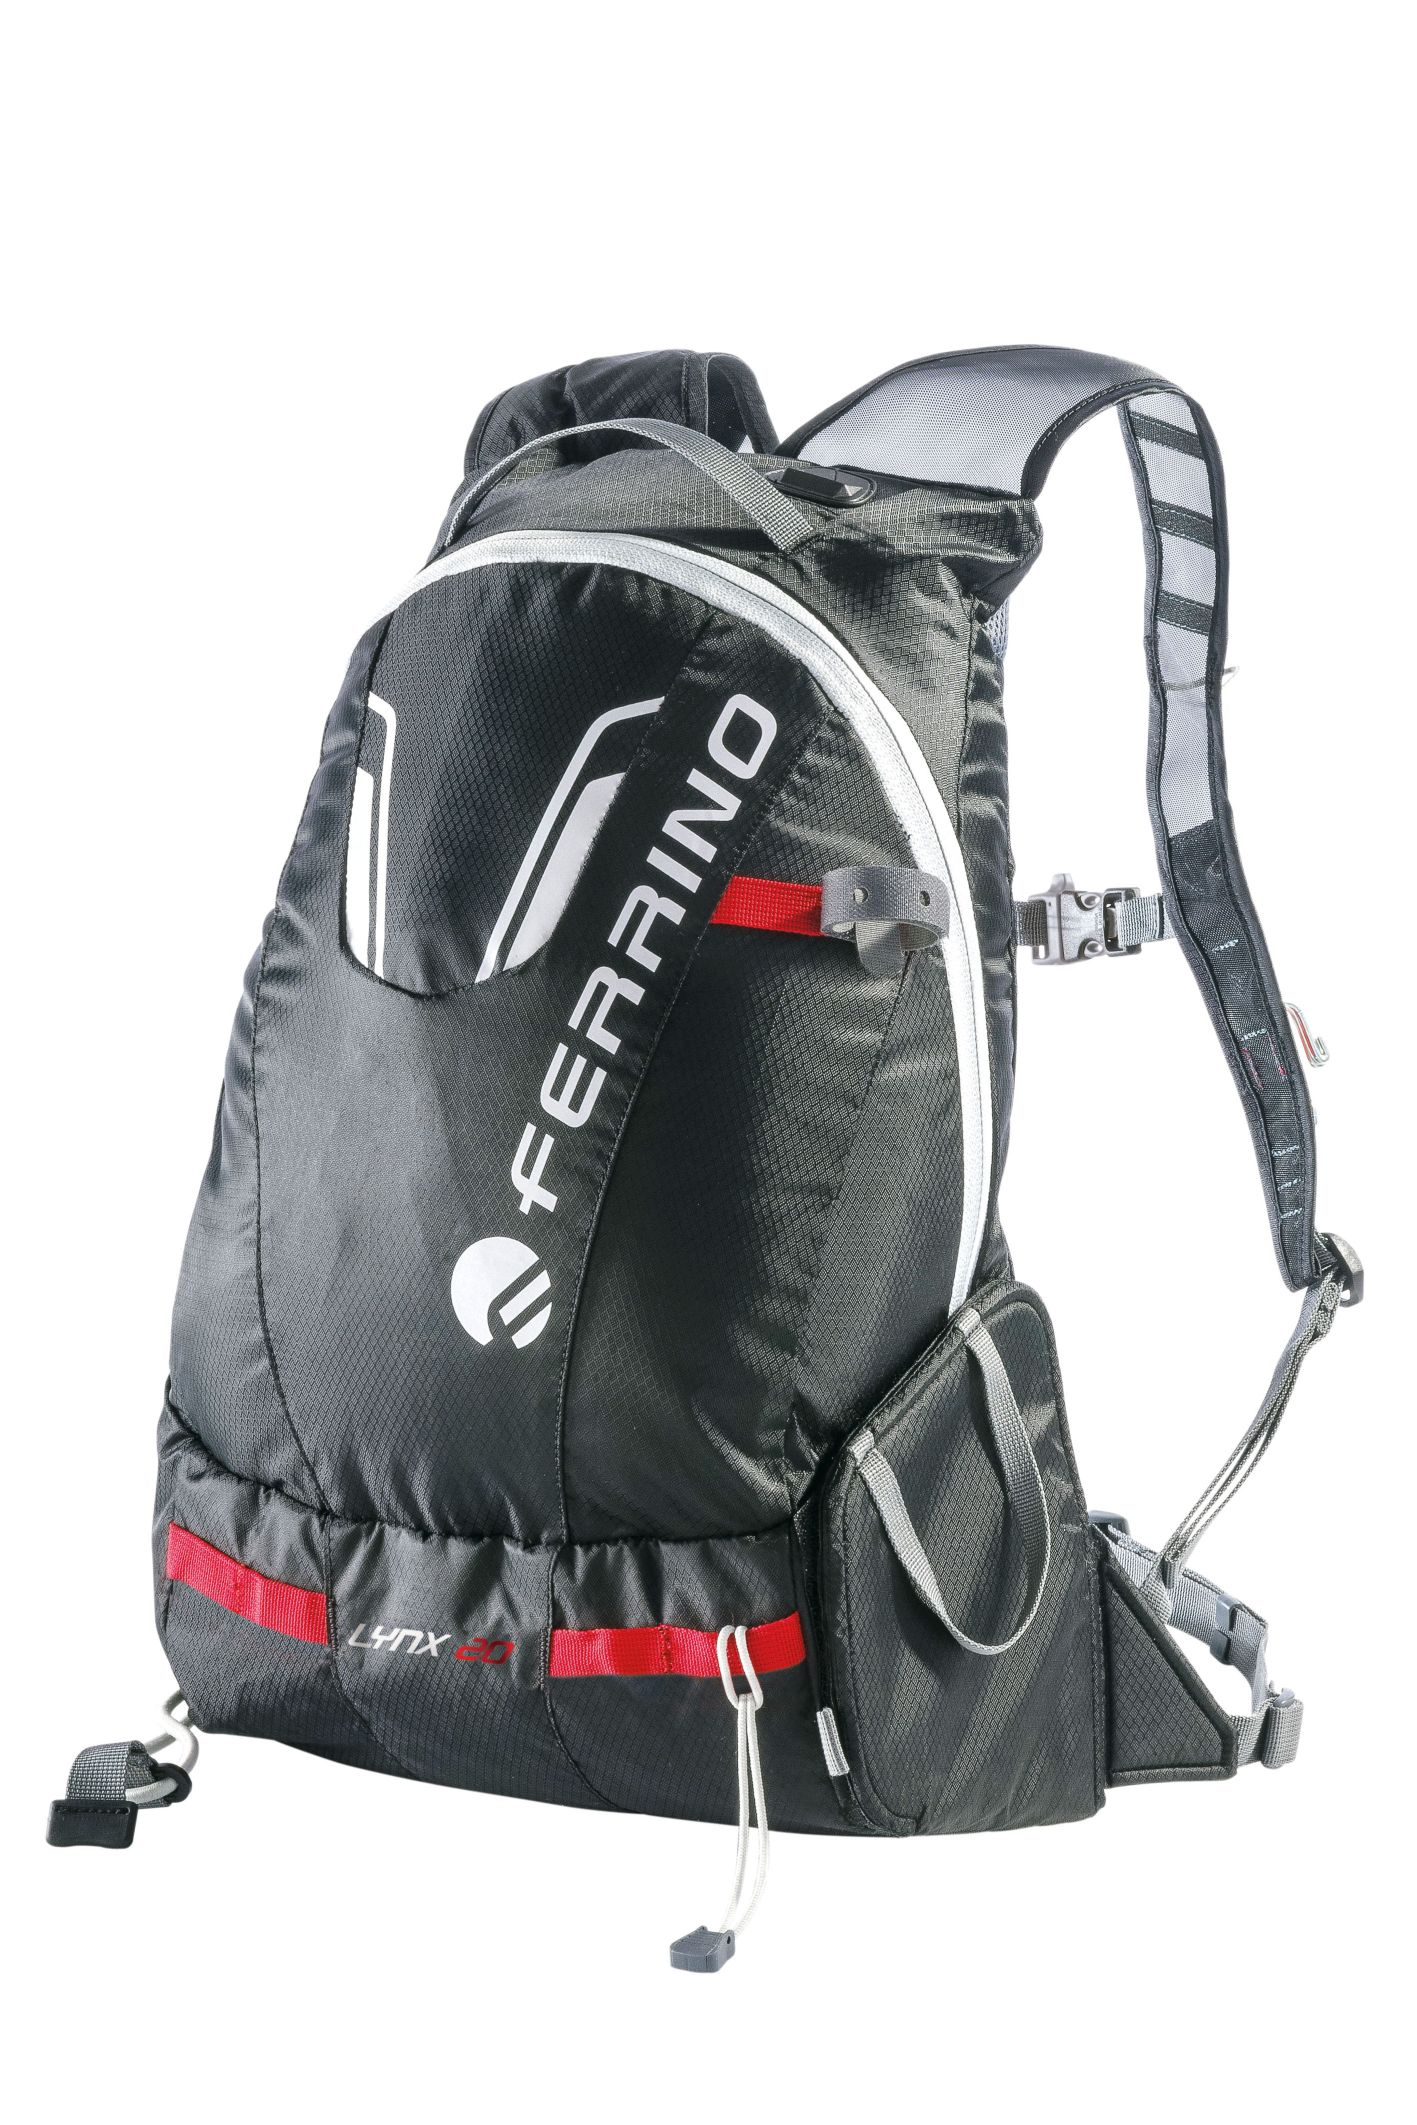 Ski touringový batoh Ferrino LYNX 20 c684d45d6c